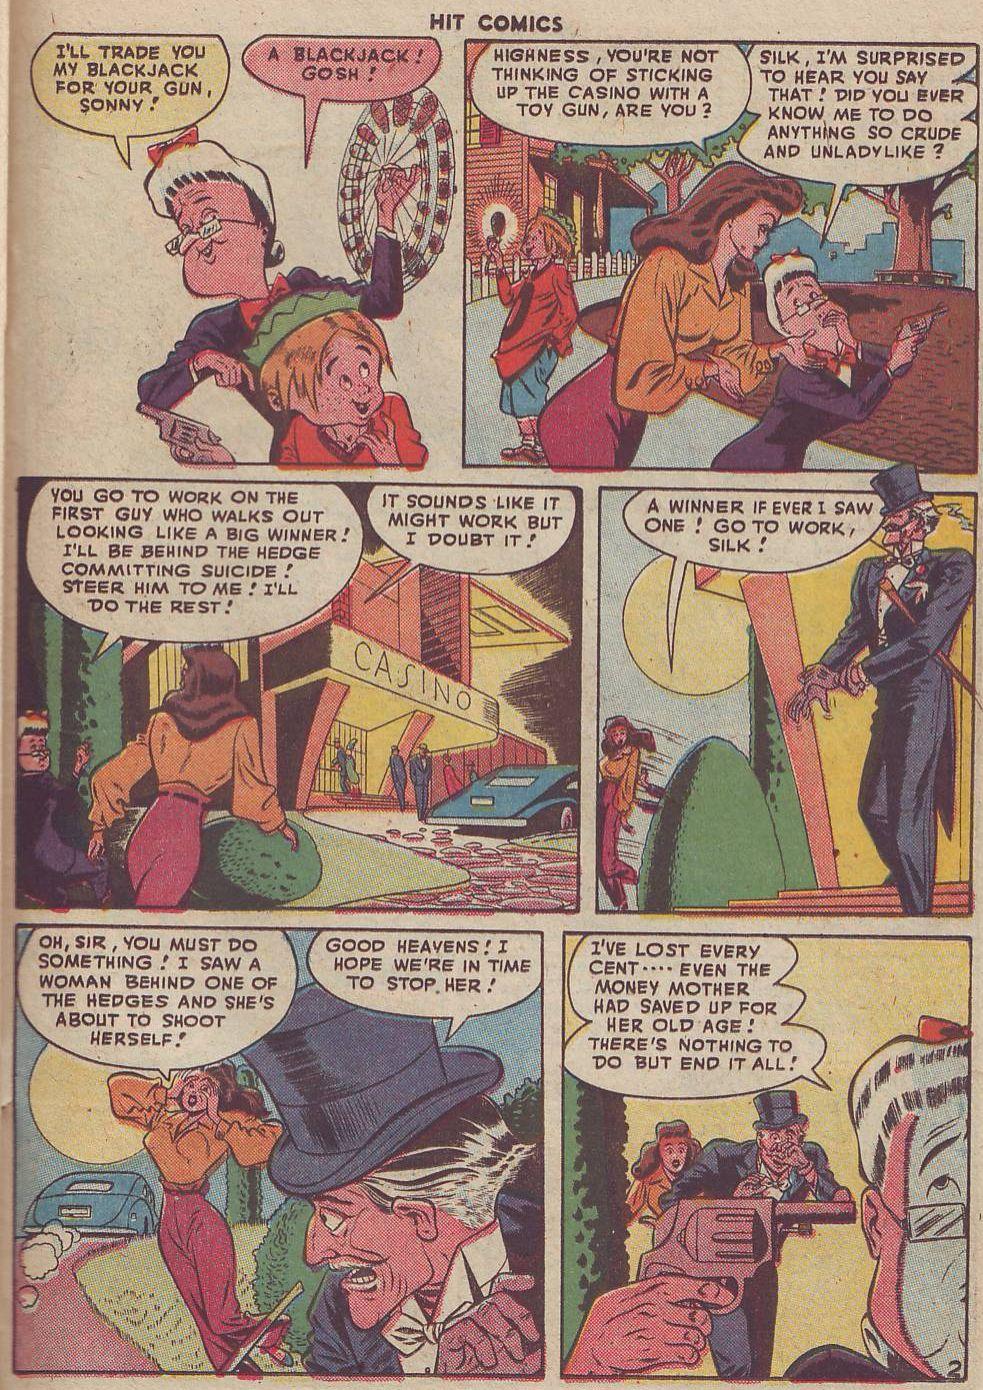 Read online Hit Comics comic -  Issue #51 - 33